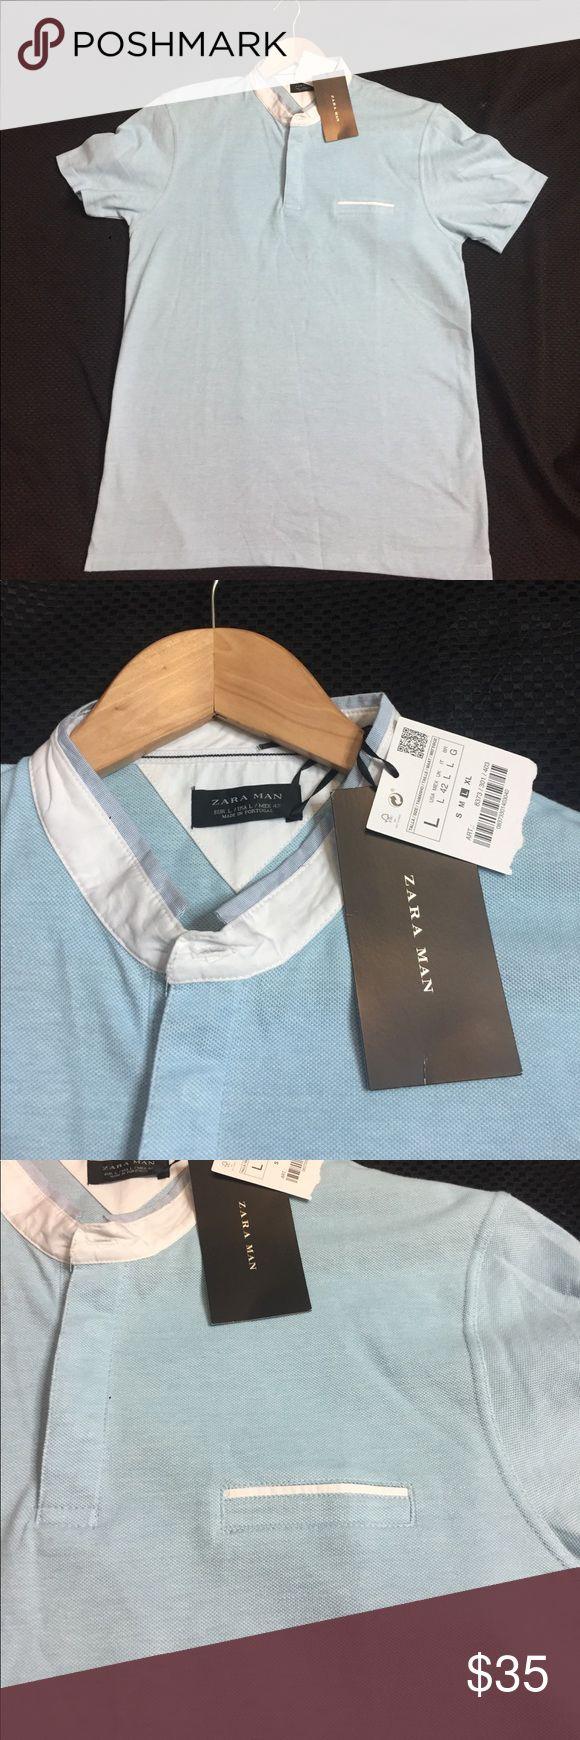 Zara Man T Shirt large light Blue/White one pocket New with tag light blue and white t shirt with one pocket large Zara Shirts Polos